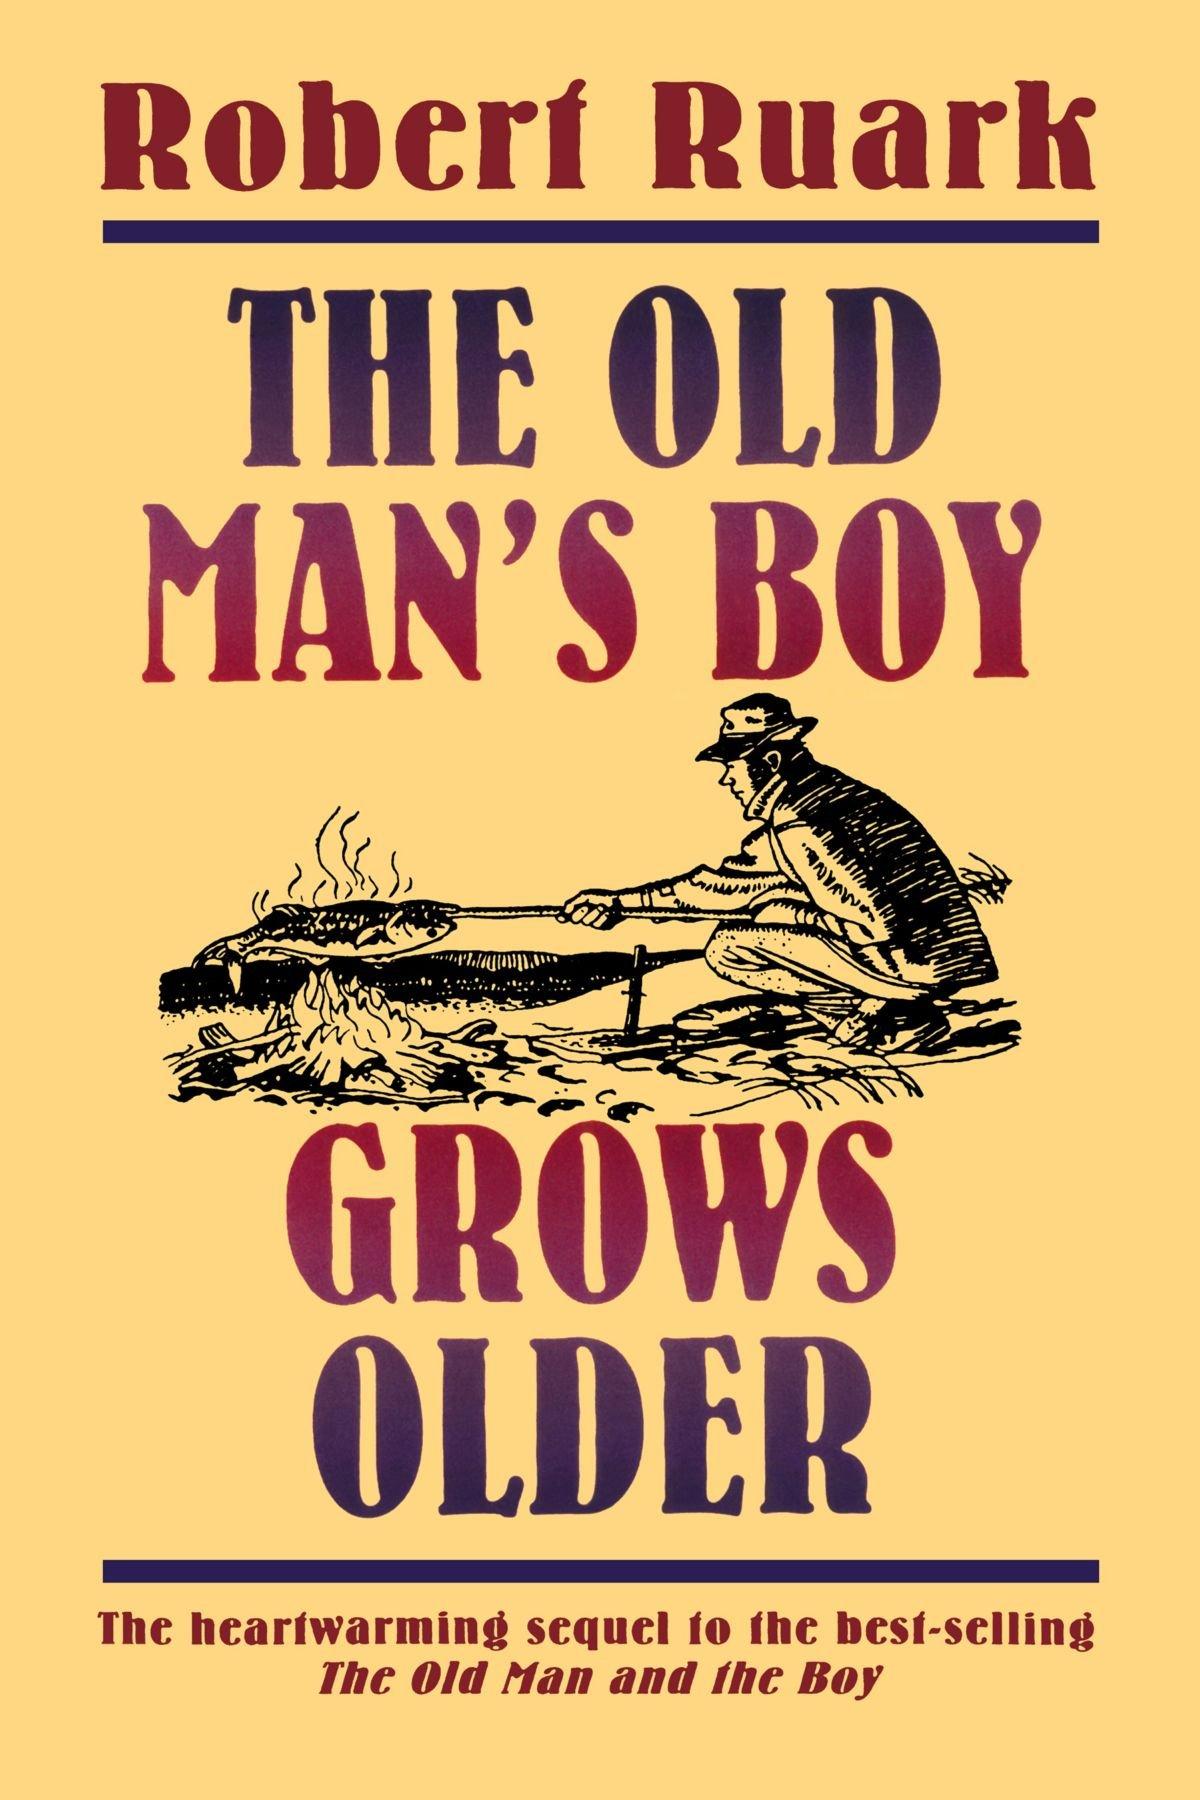 Download The Old Man's Boy Grows Older PDF